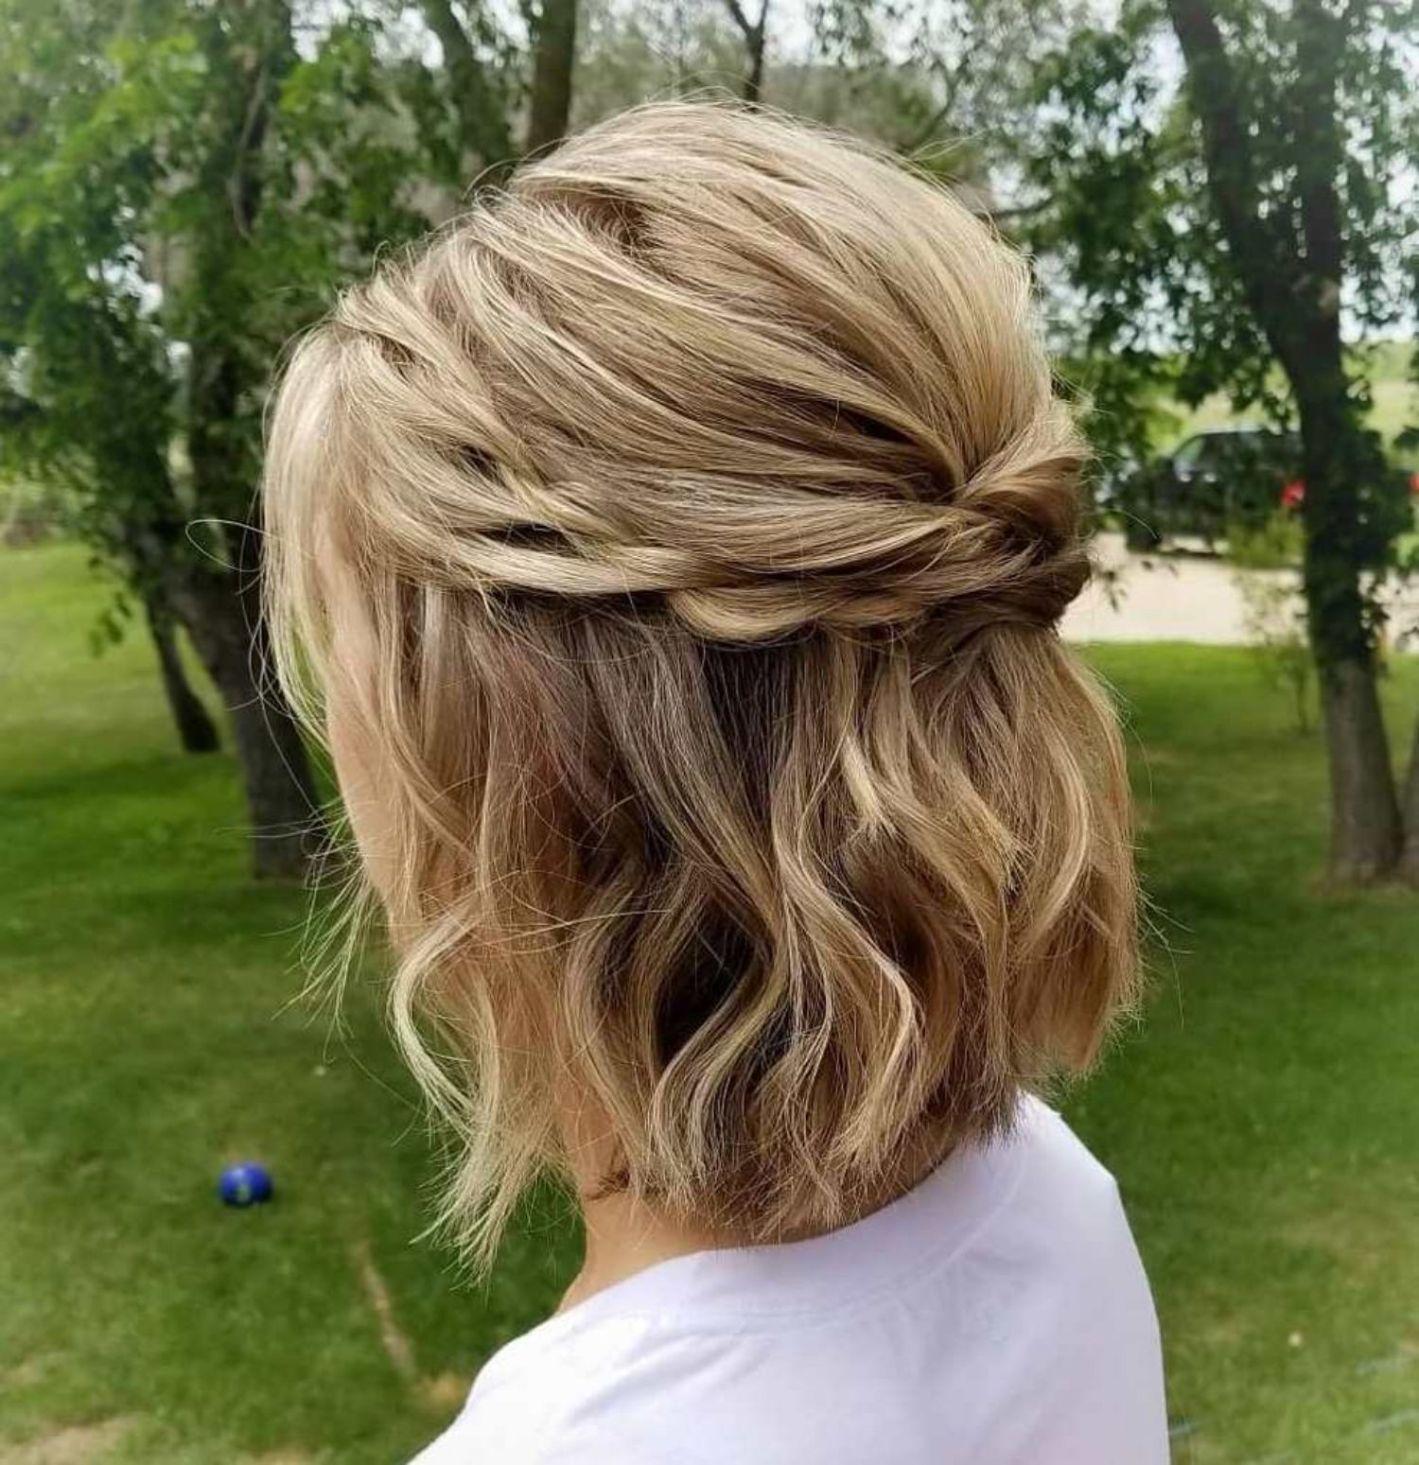 60 Trendiest Updos for Medium Length Hair | Updos for ...